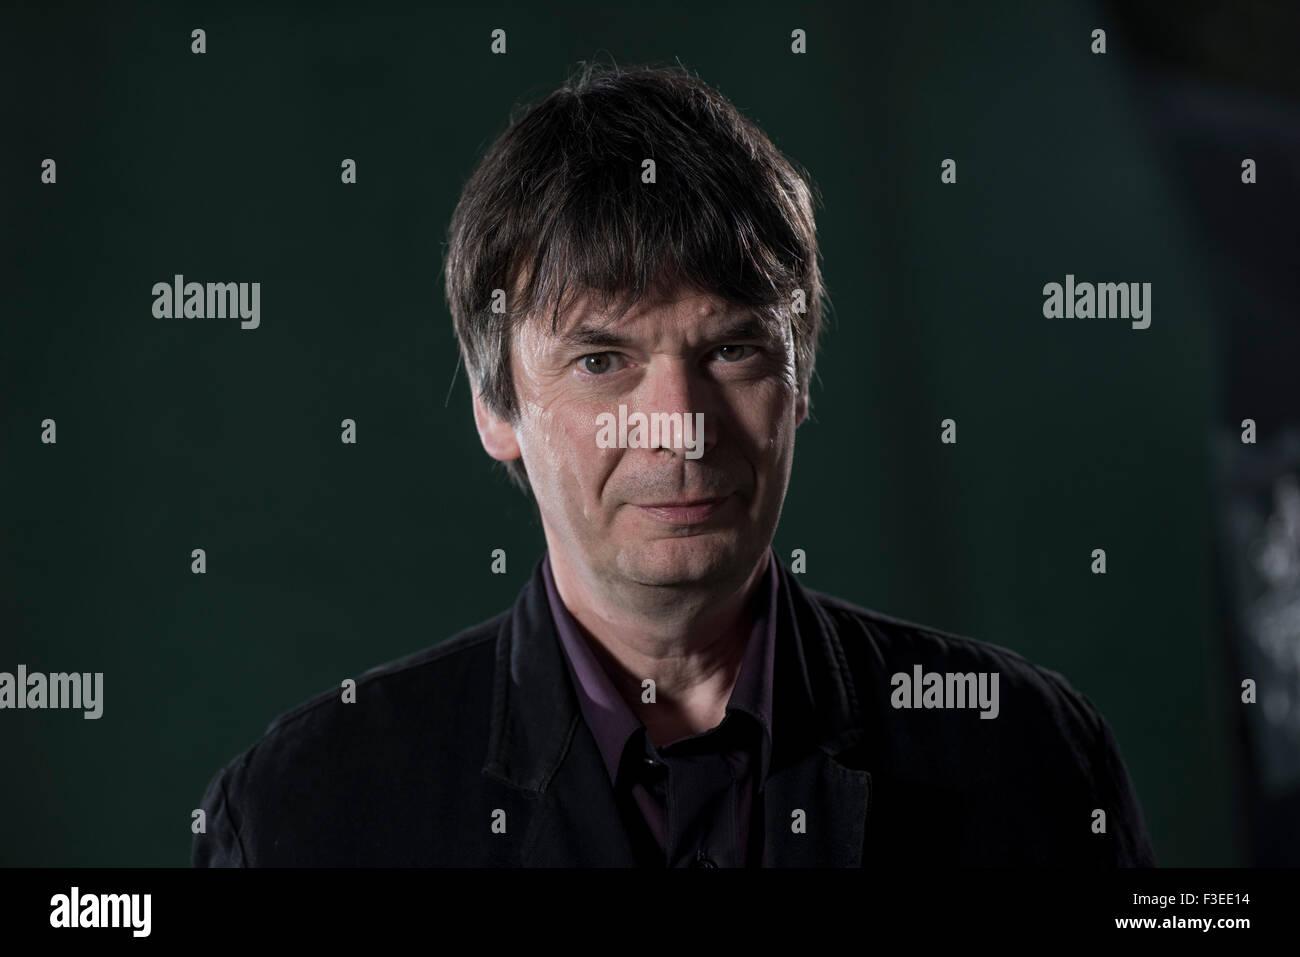 Scottish crime writer Ian Rankin, OBE, DL, FRSE. - Stock Image